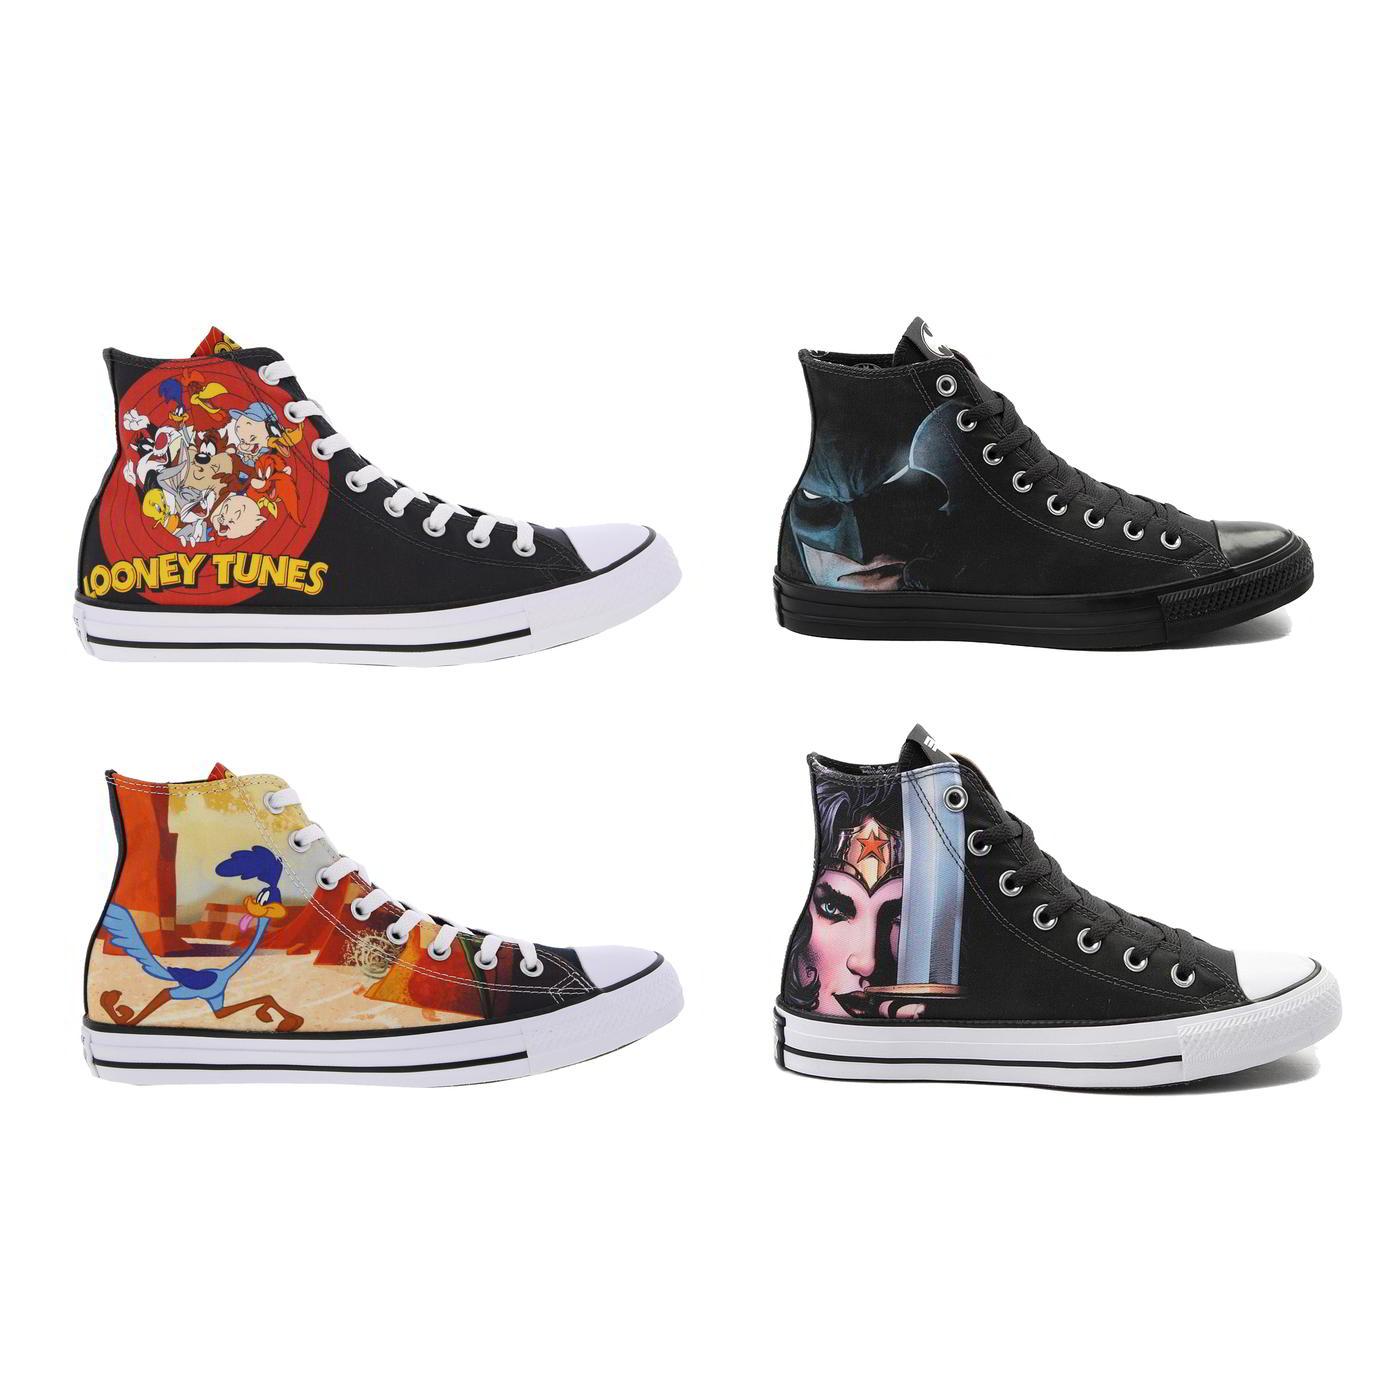 batman converse shoes dc x-comics gmbh definition of respect for